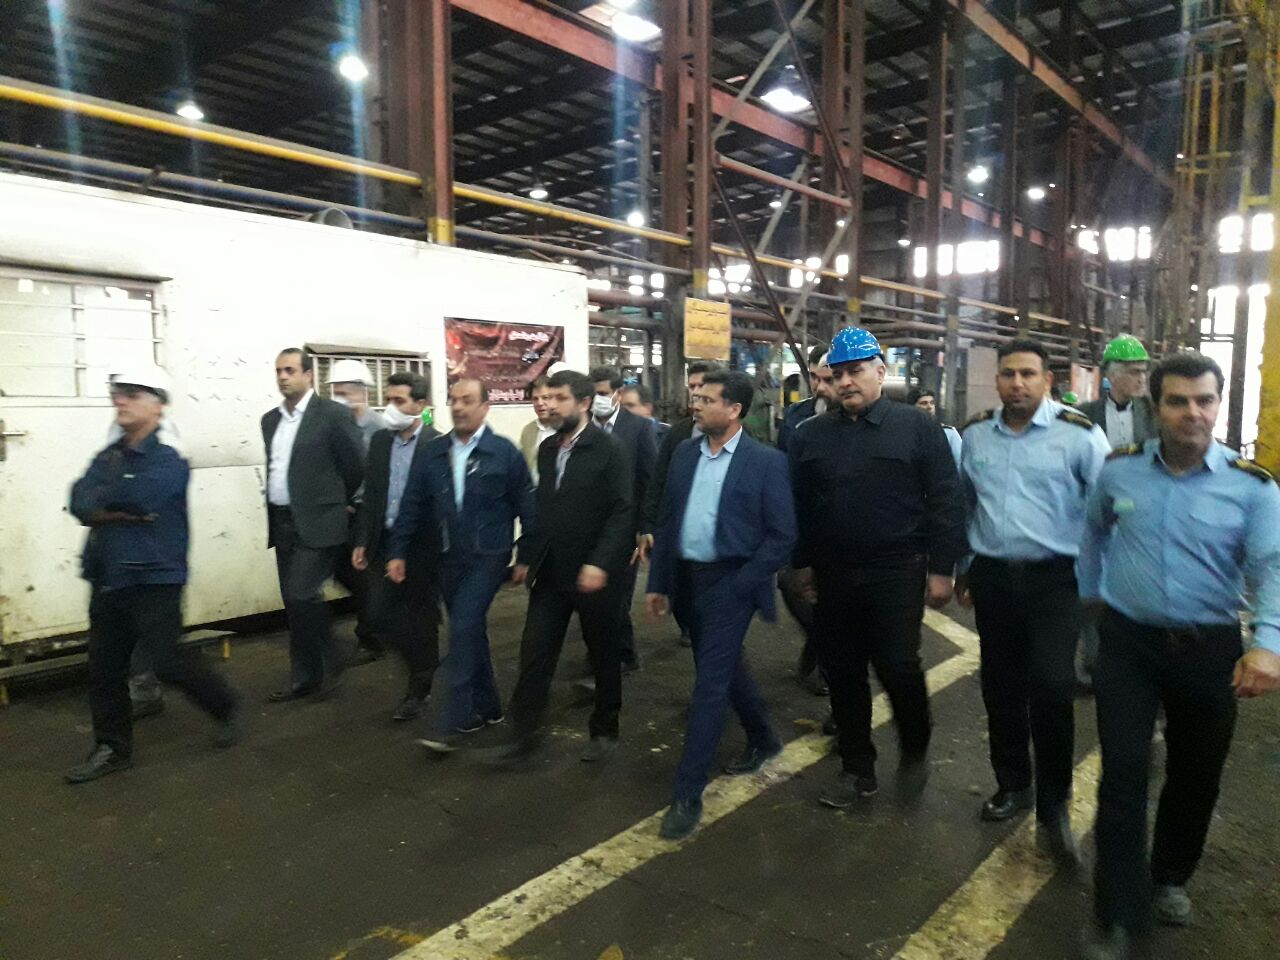 IMG 20200502 063804 349 شرکت لولهسازی اهواز در سال جهش تولید ظرفیت همکاری با صنایع را افزایش داد